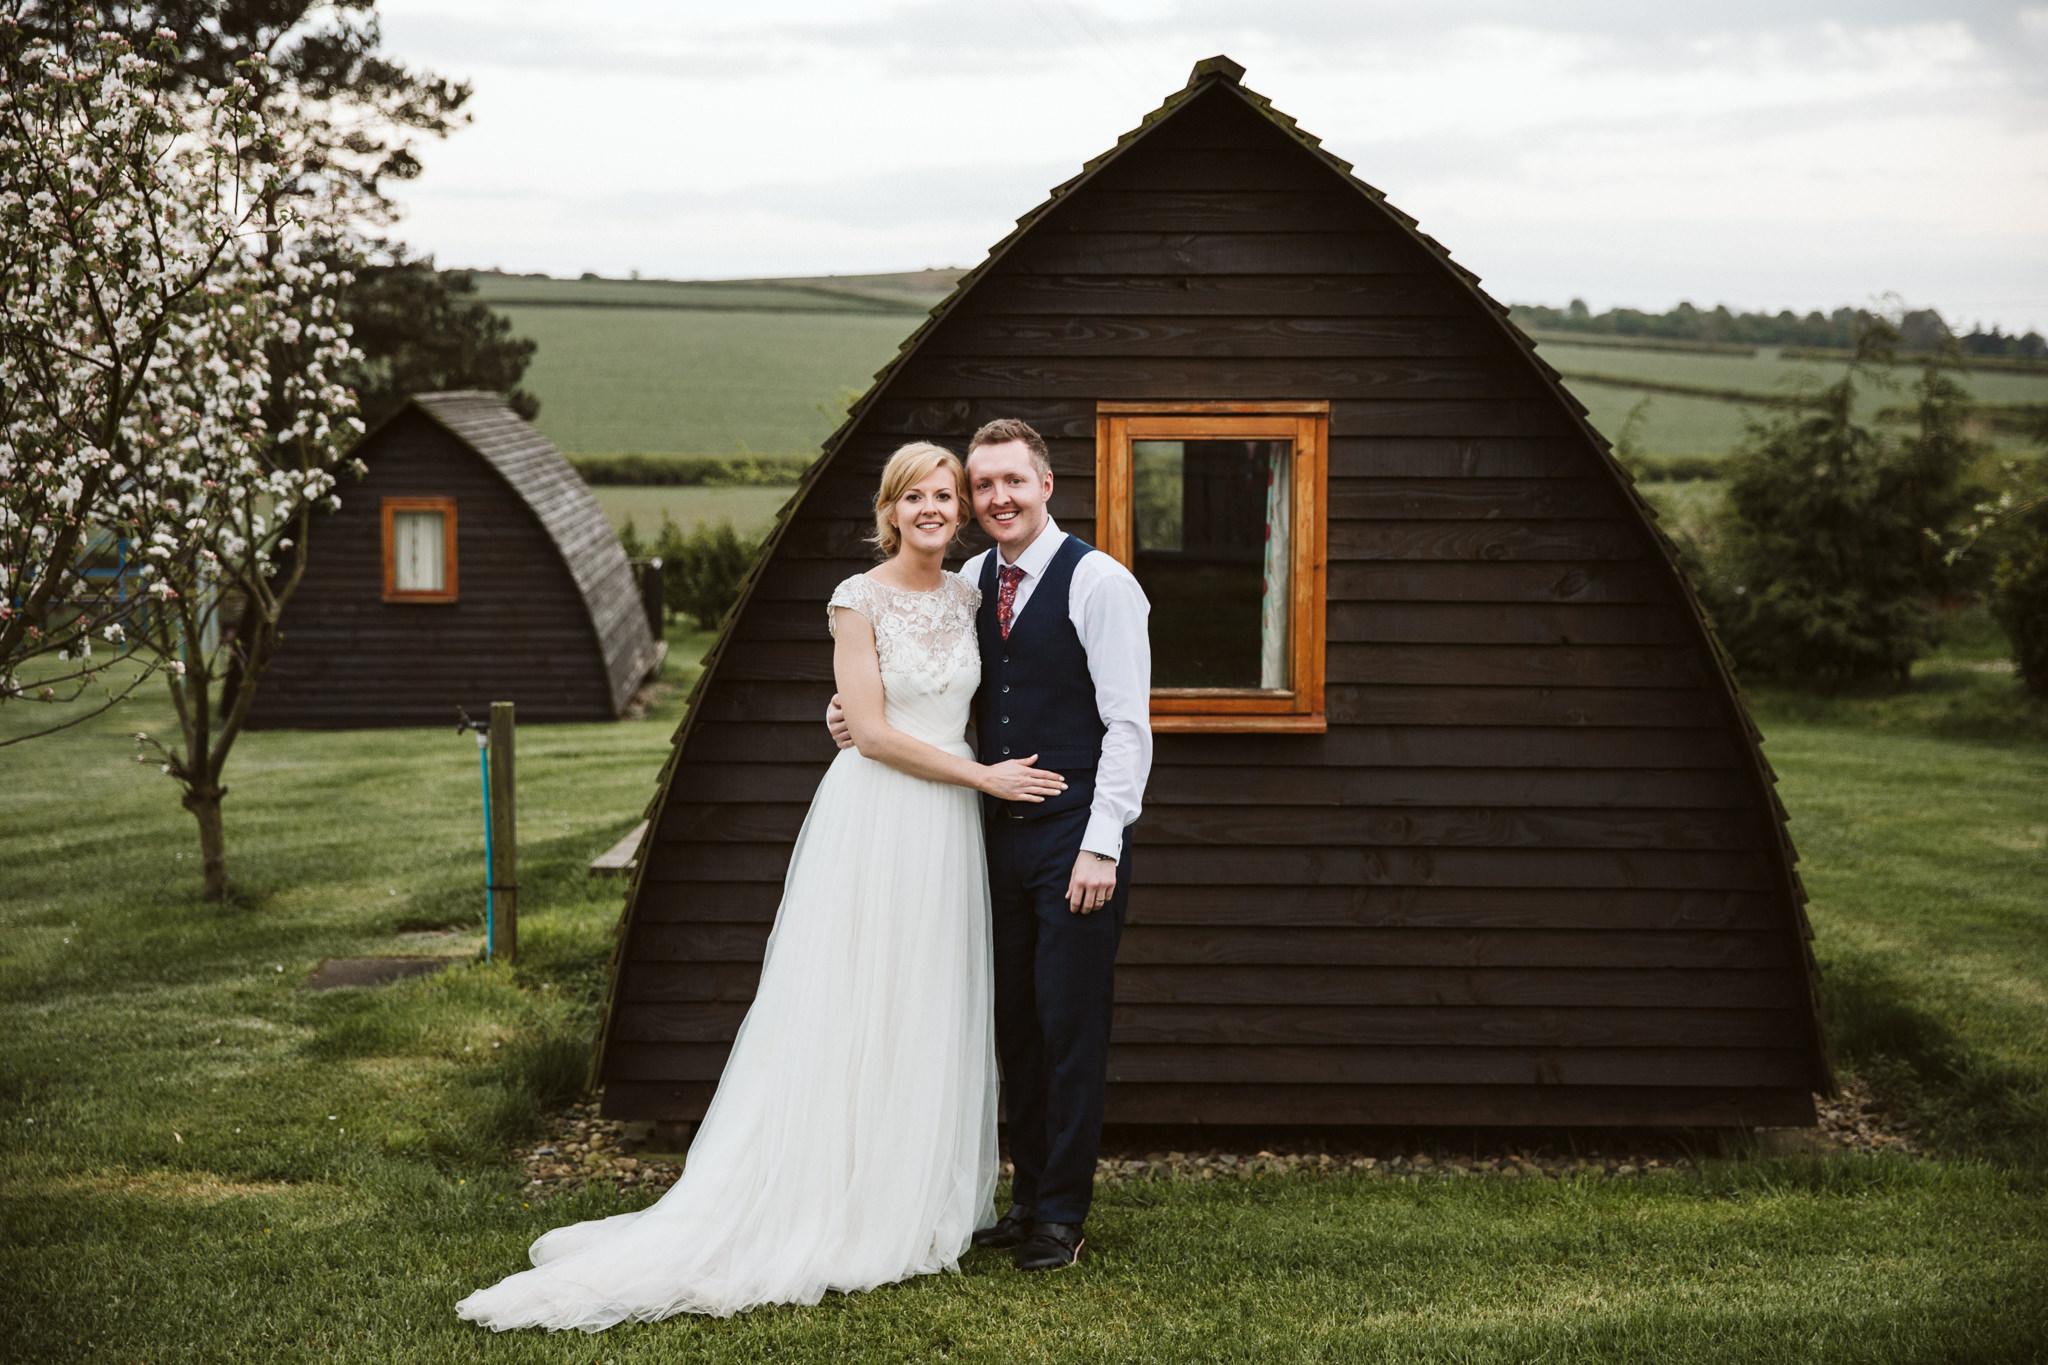 northside-farm-wedding-northumberland-margarita-hope (175).jpg